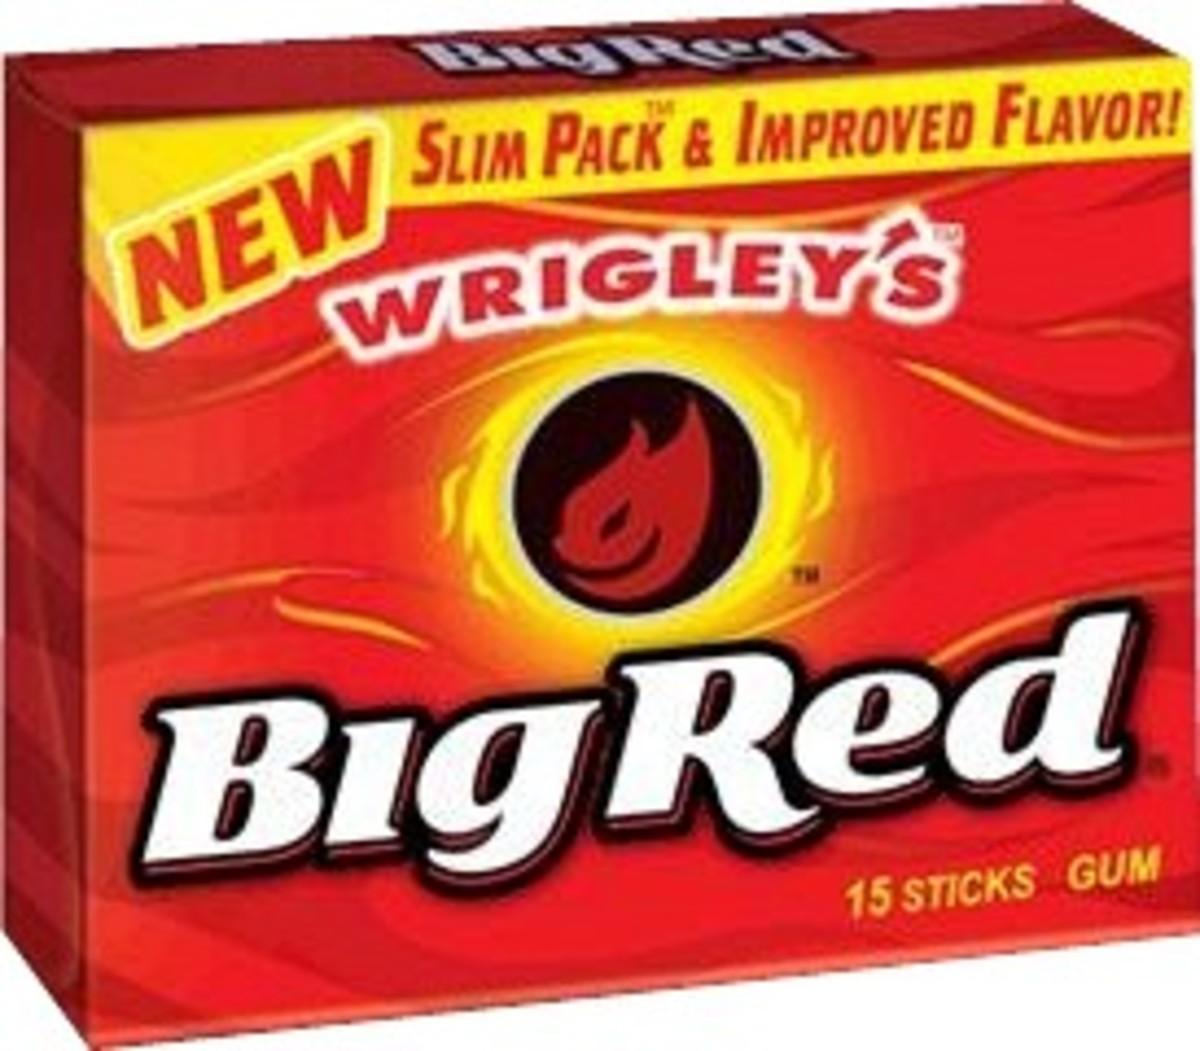 wrigleys-big-red-gum-ingredients-explained